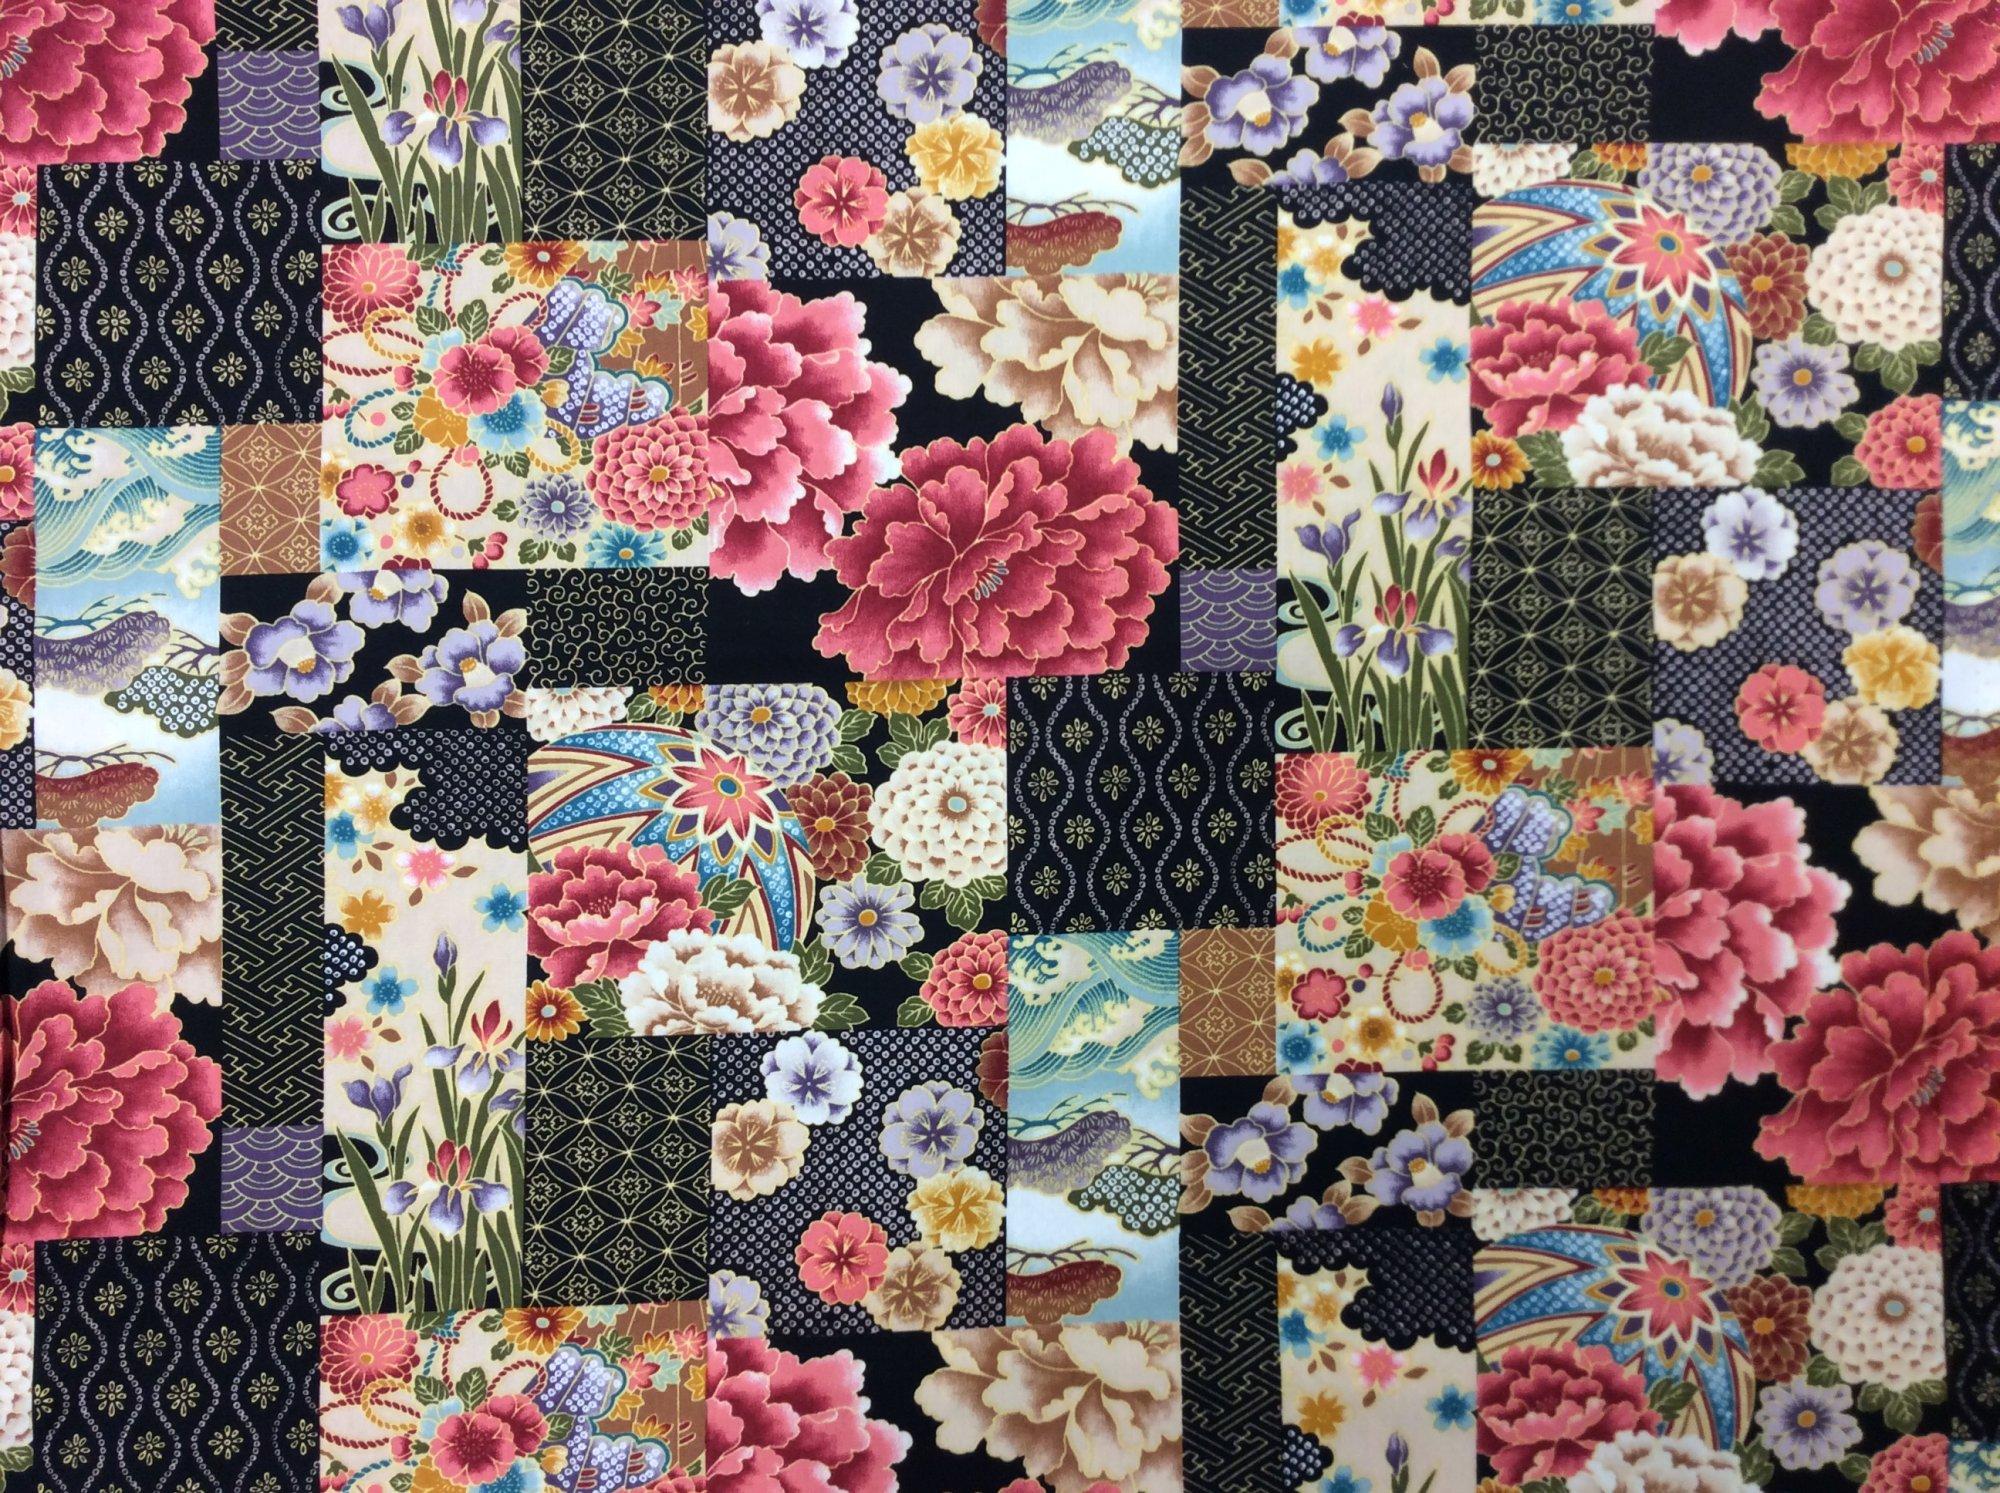 Asian Exotic Floral Patchwork Multicolor Gold Japan Asian Cotton Quilt Fabric TP05